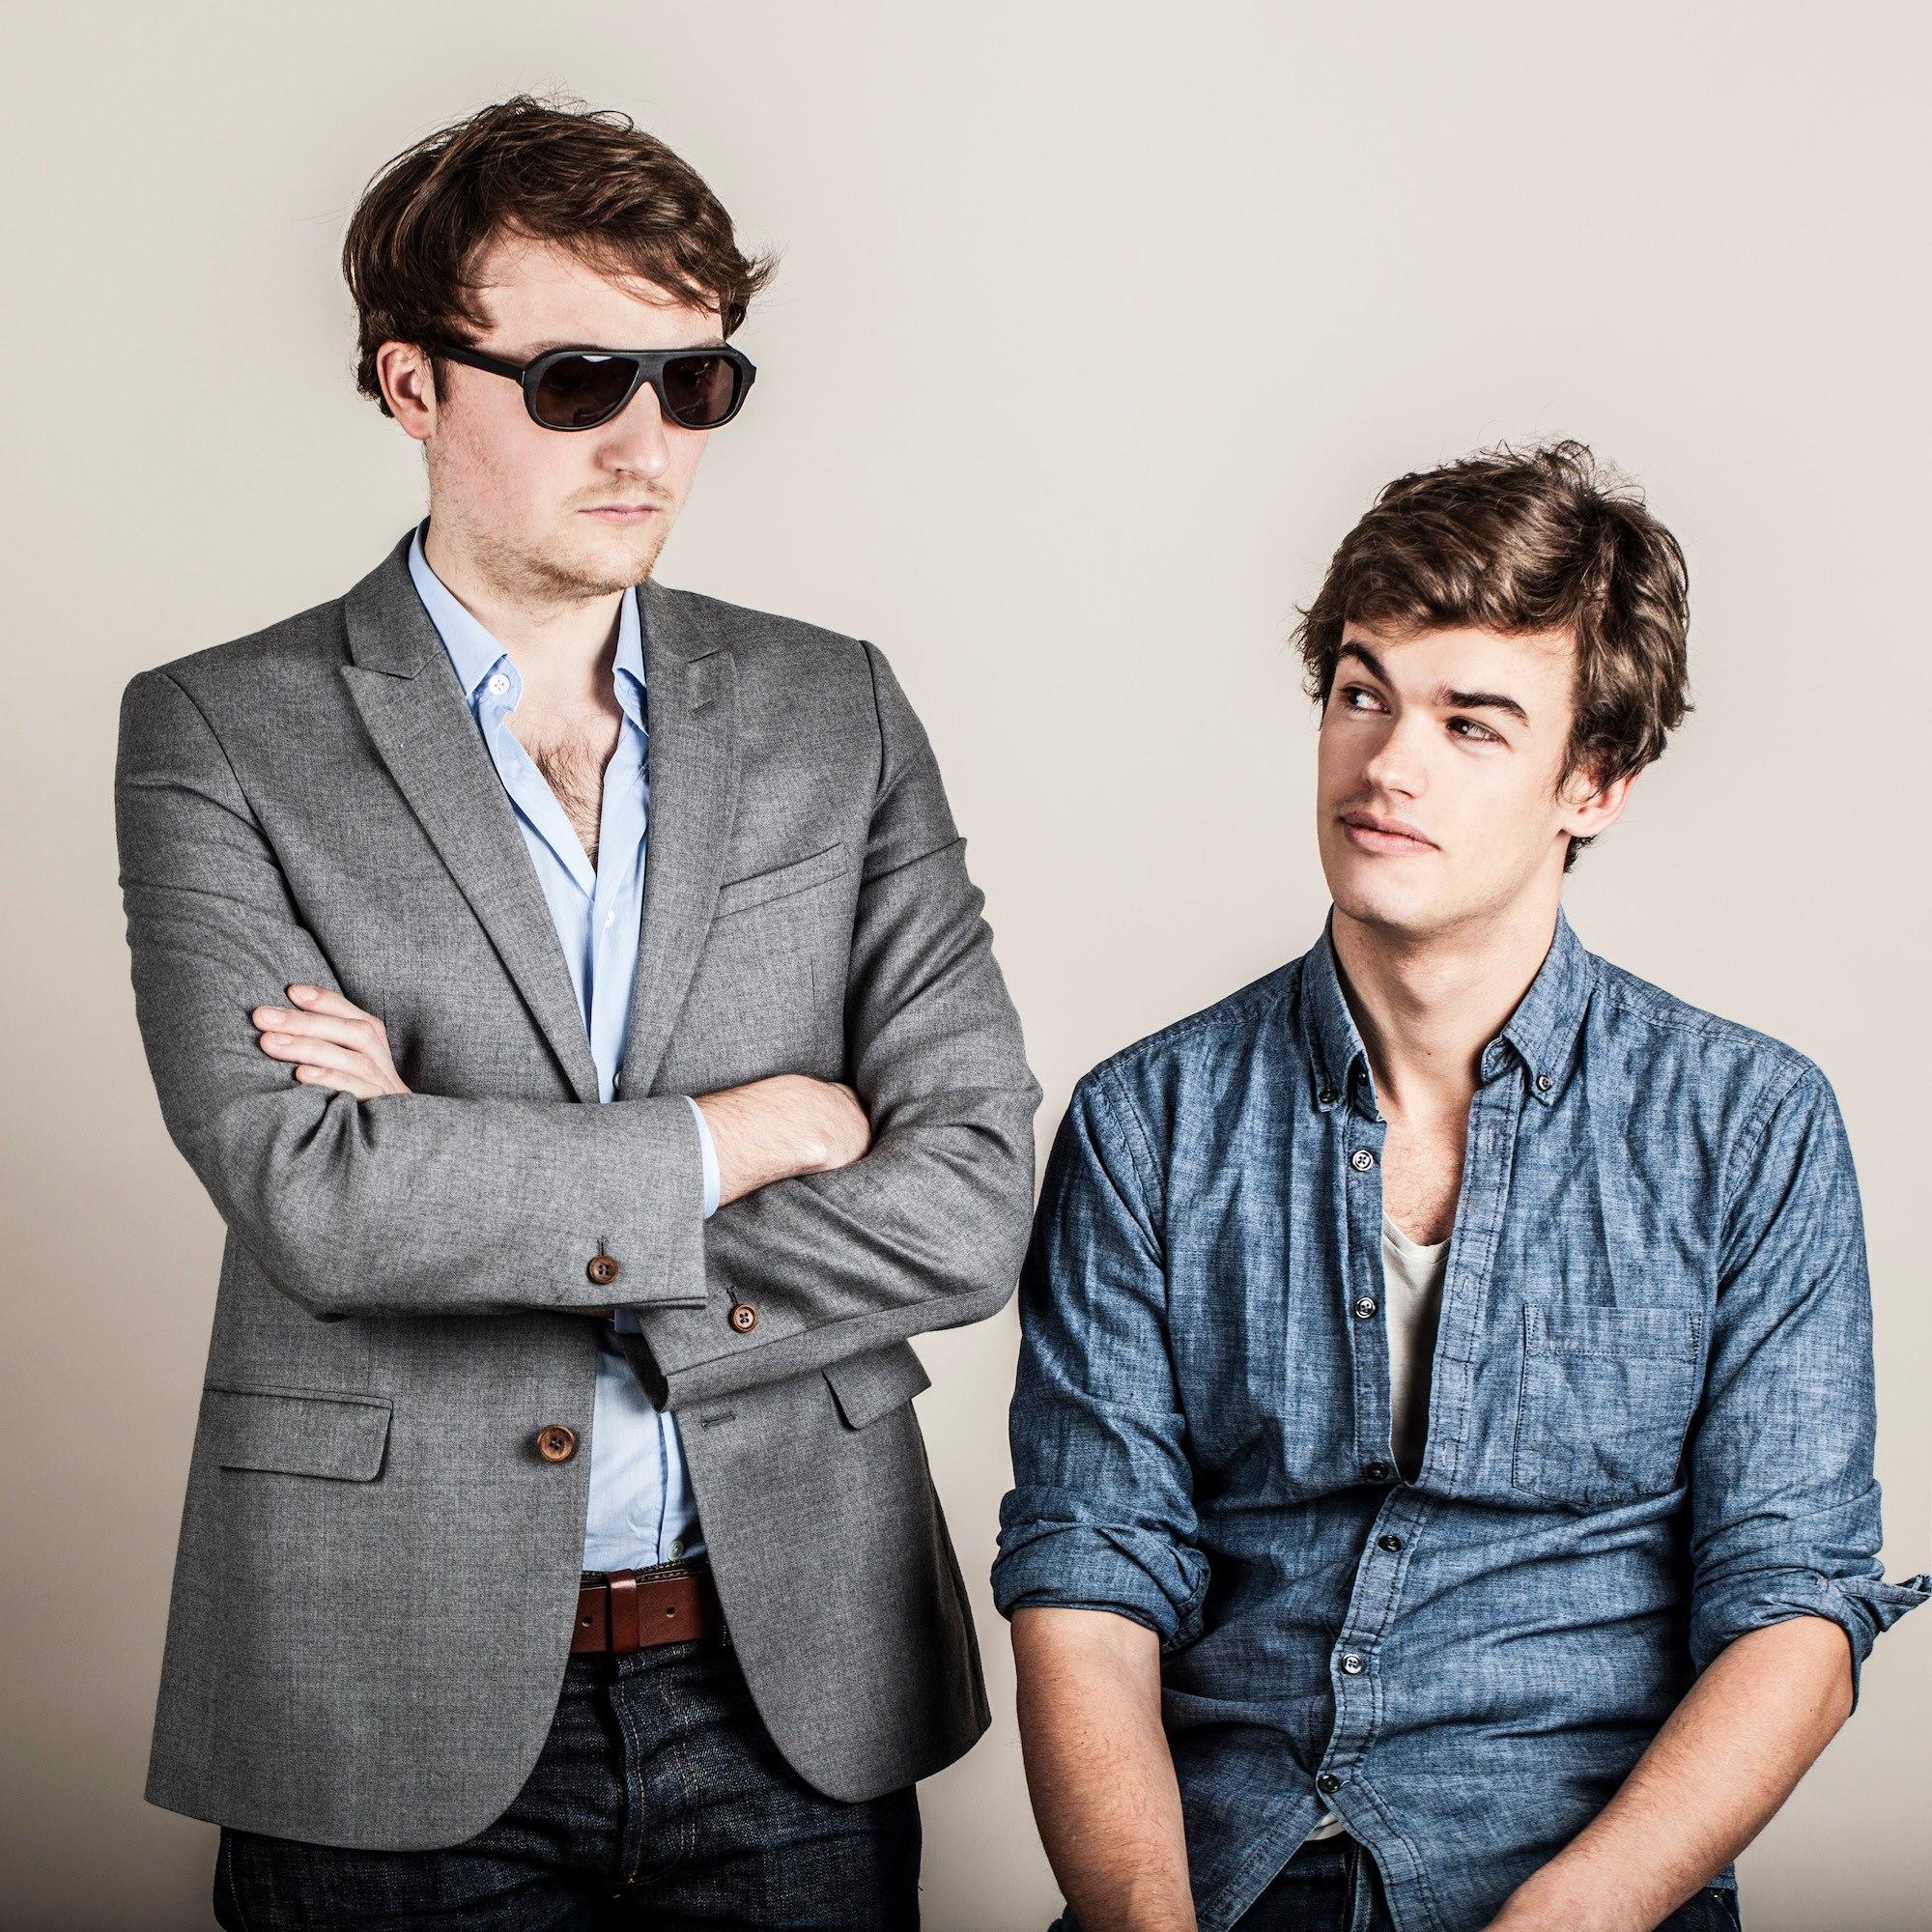 Les fondateurs de Bonnegueule, Benoît Wojtenka et Geoffrey Bruyere